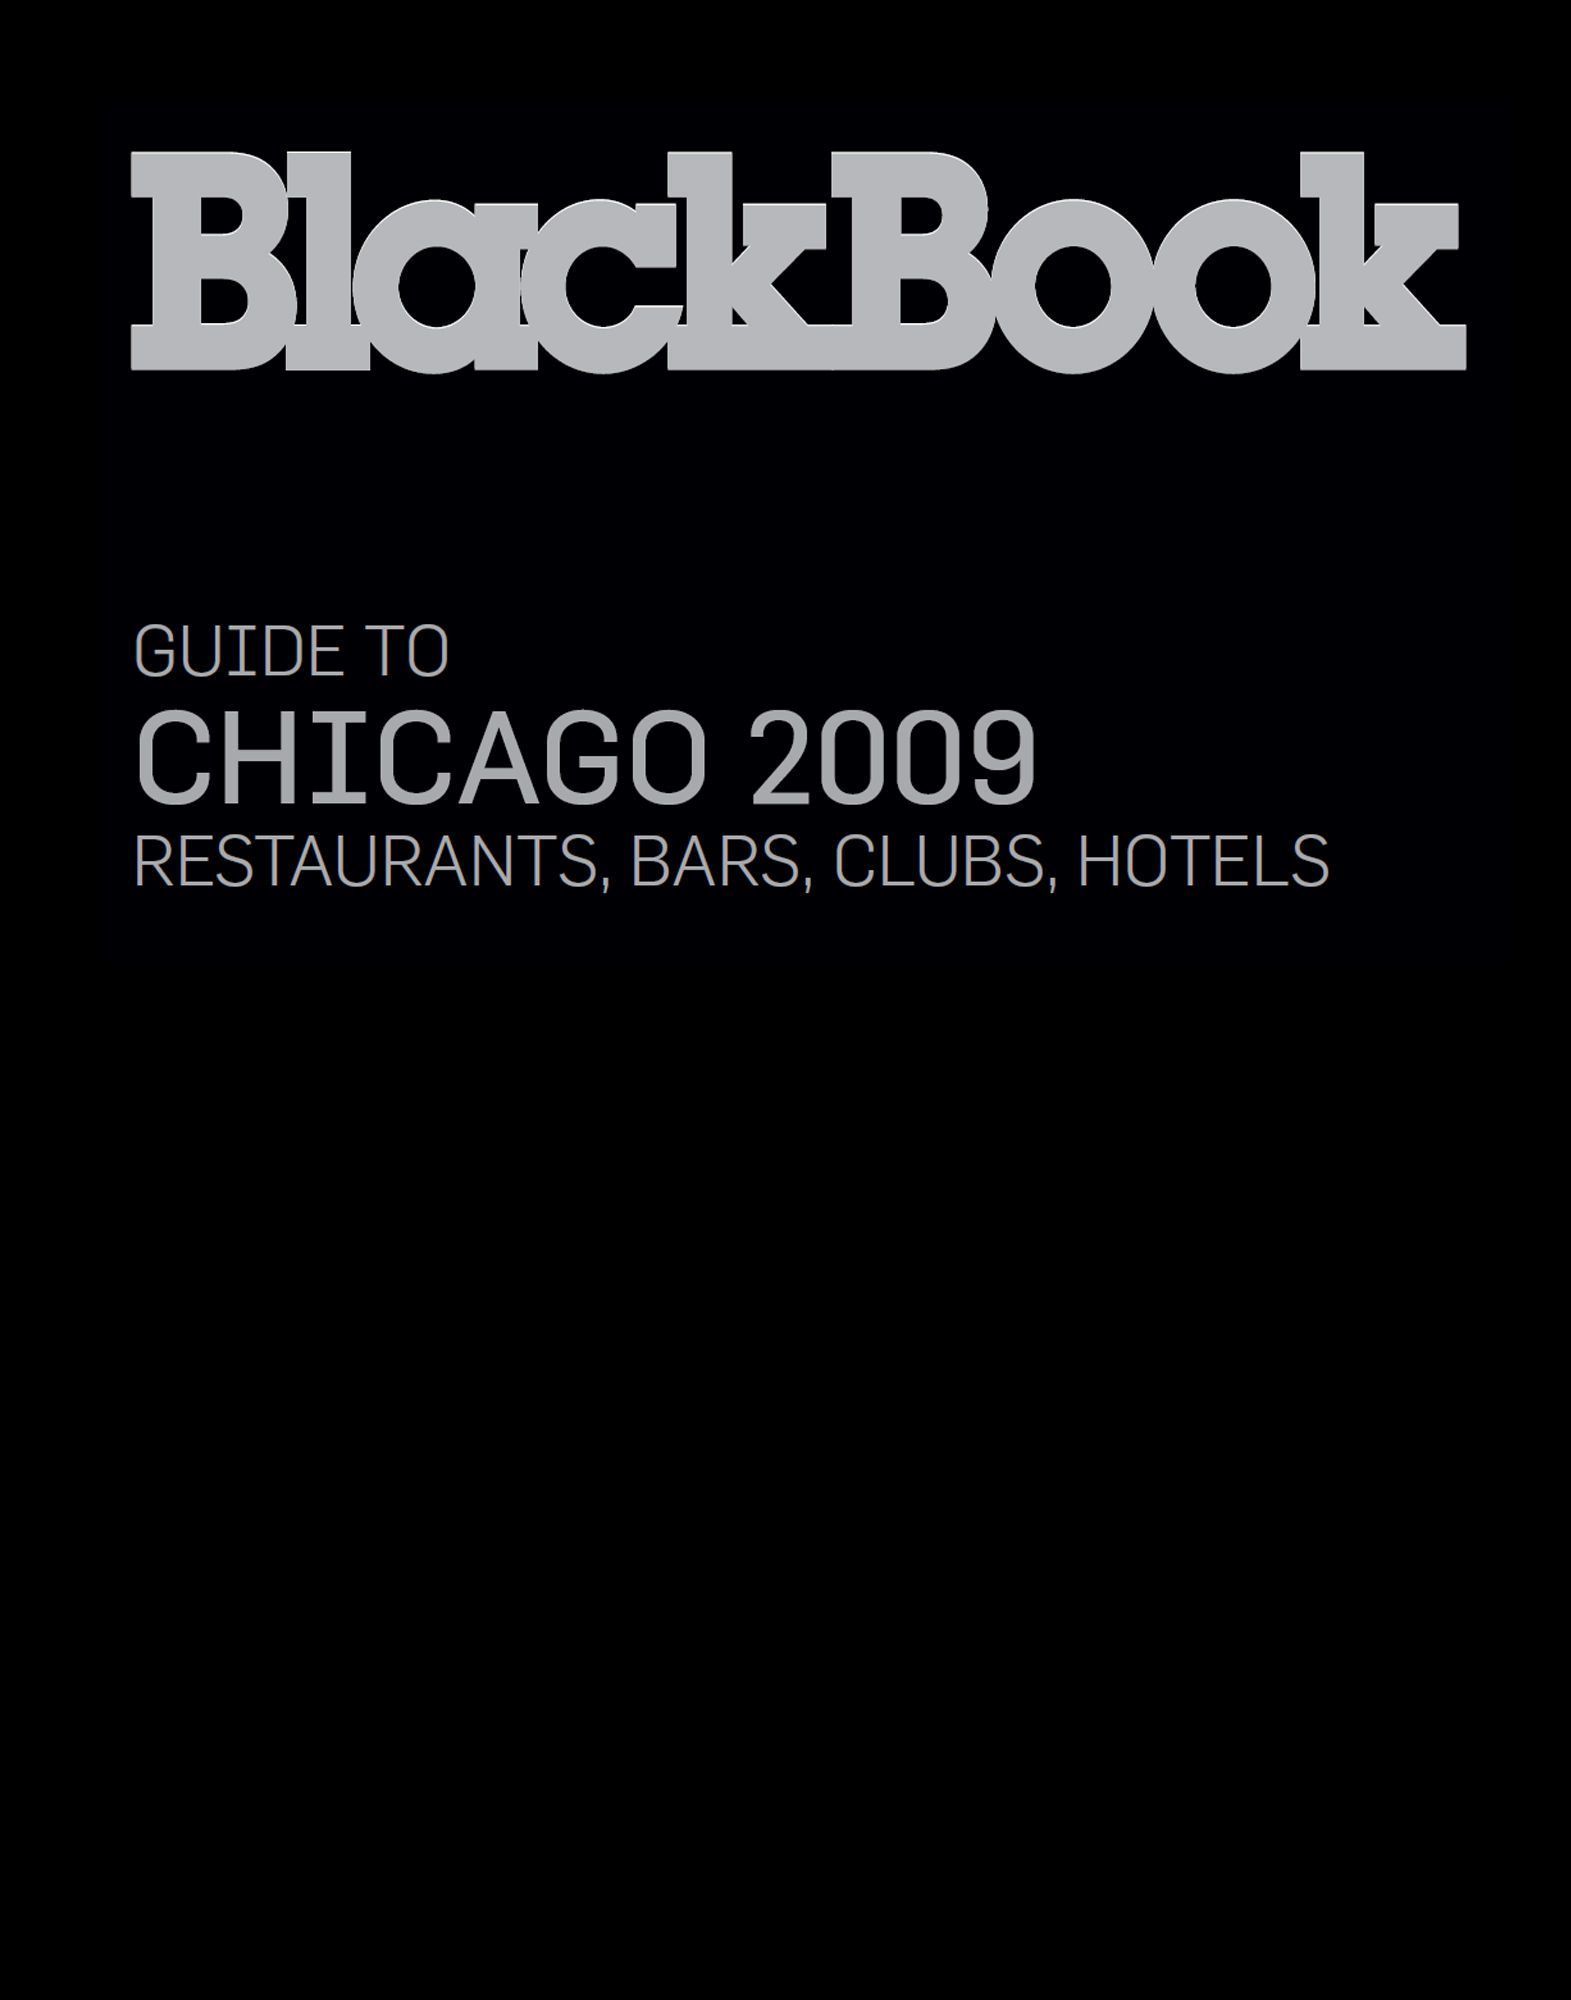 BLACKBOOK GUIDE LIFESTYLE  Item 56000501 1